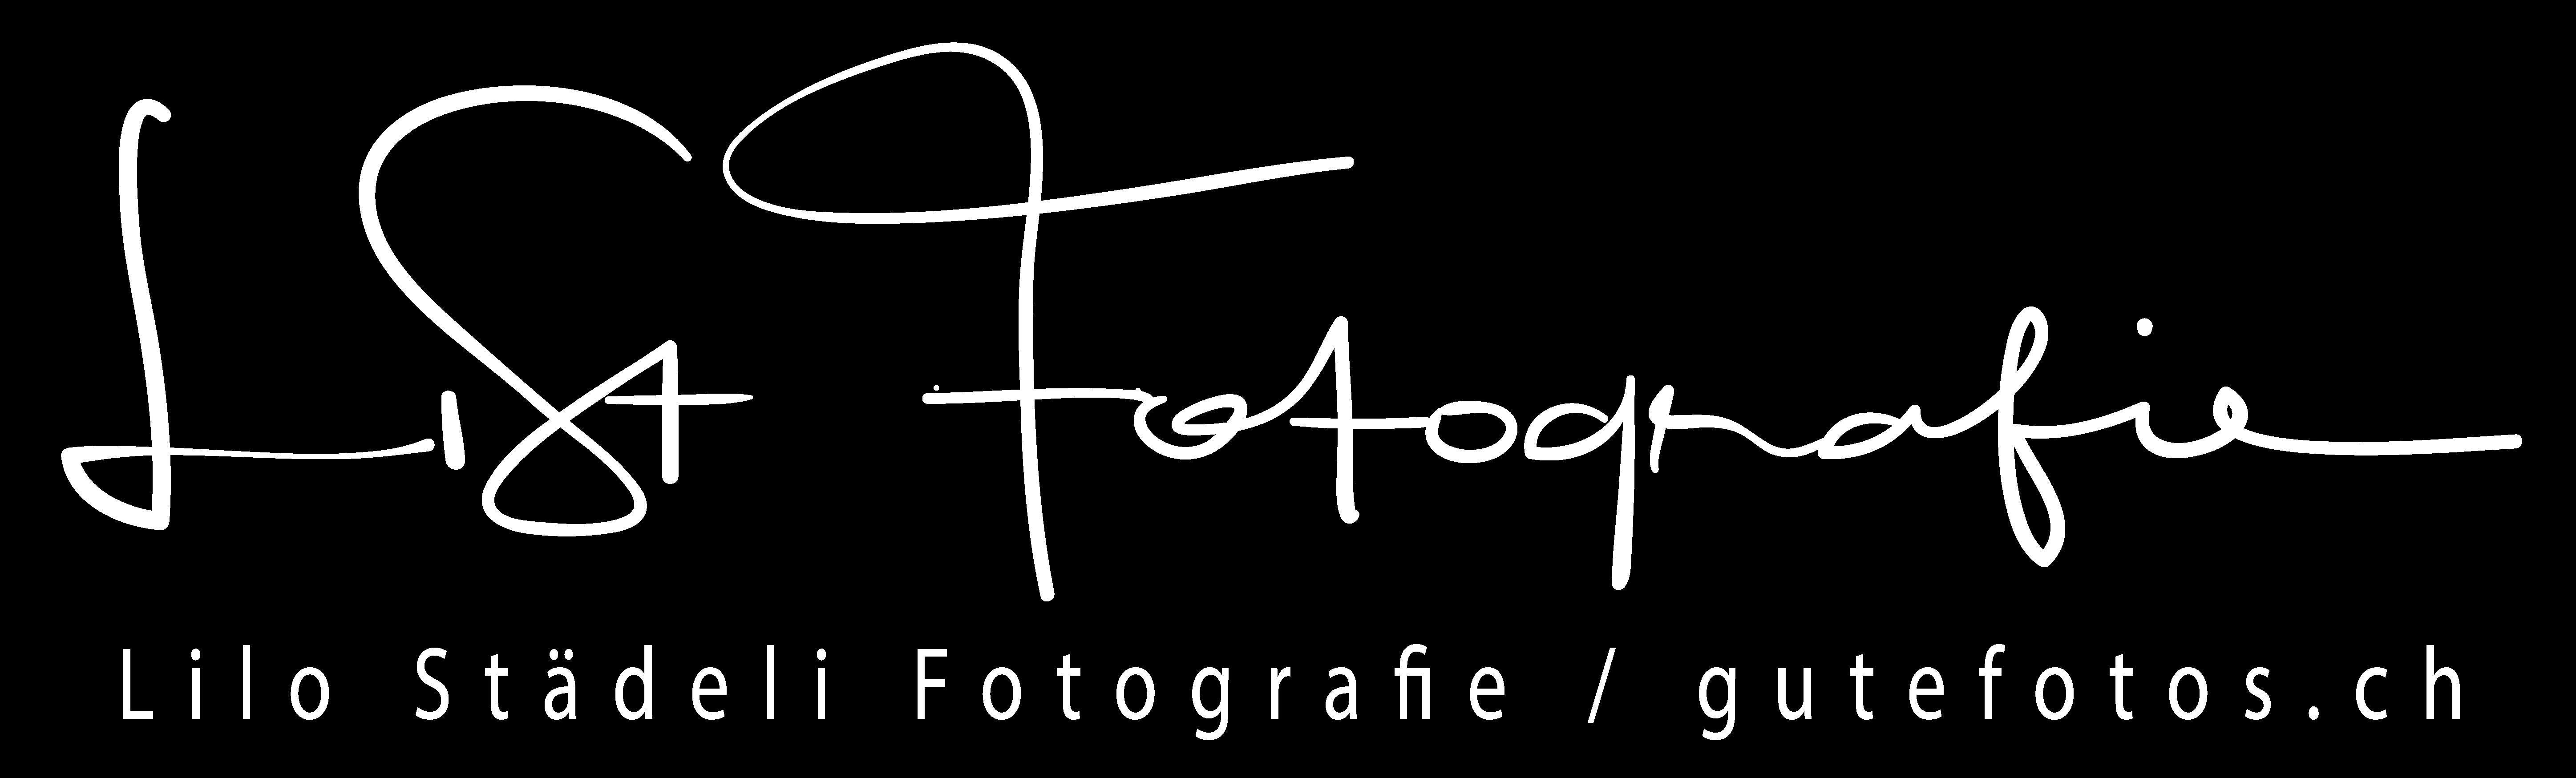 Lilo Städeli Fotografie